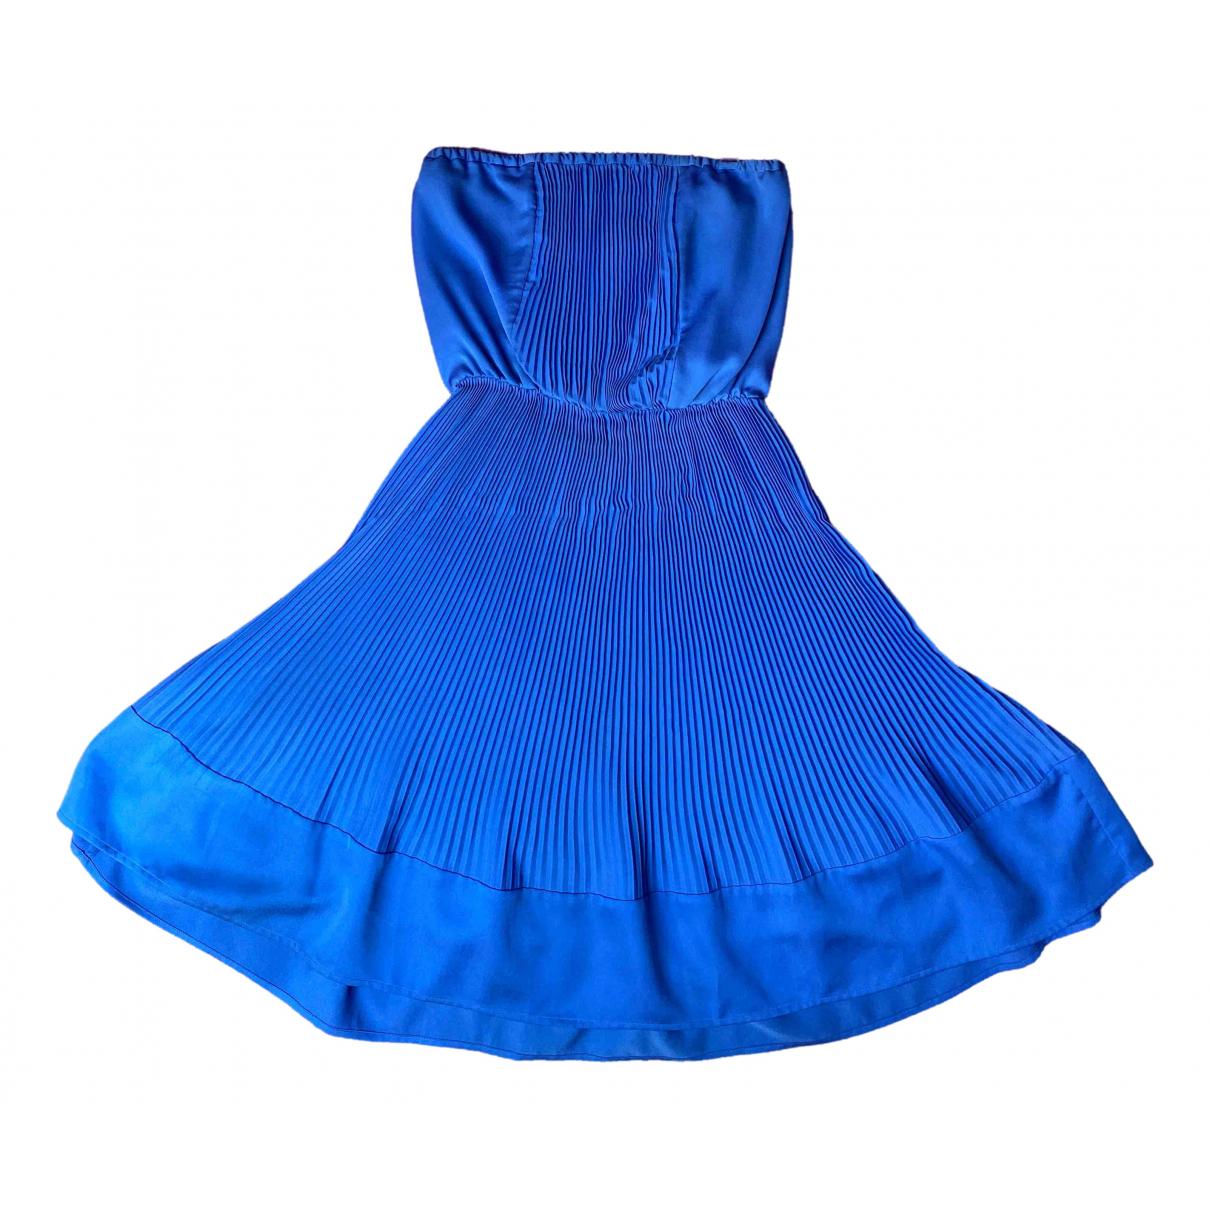 Mauro Grifoni \N Kleid in  Blau Baumwolle - Elasthan